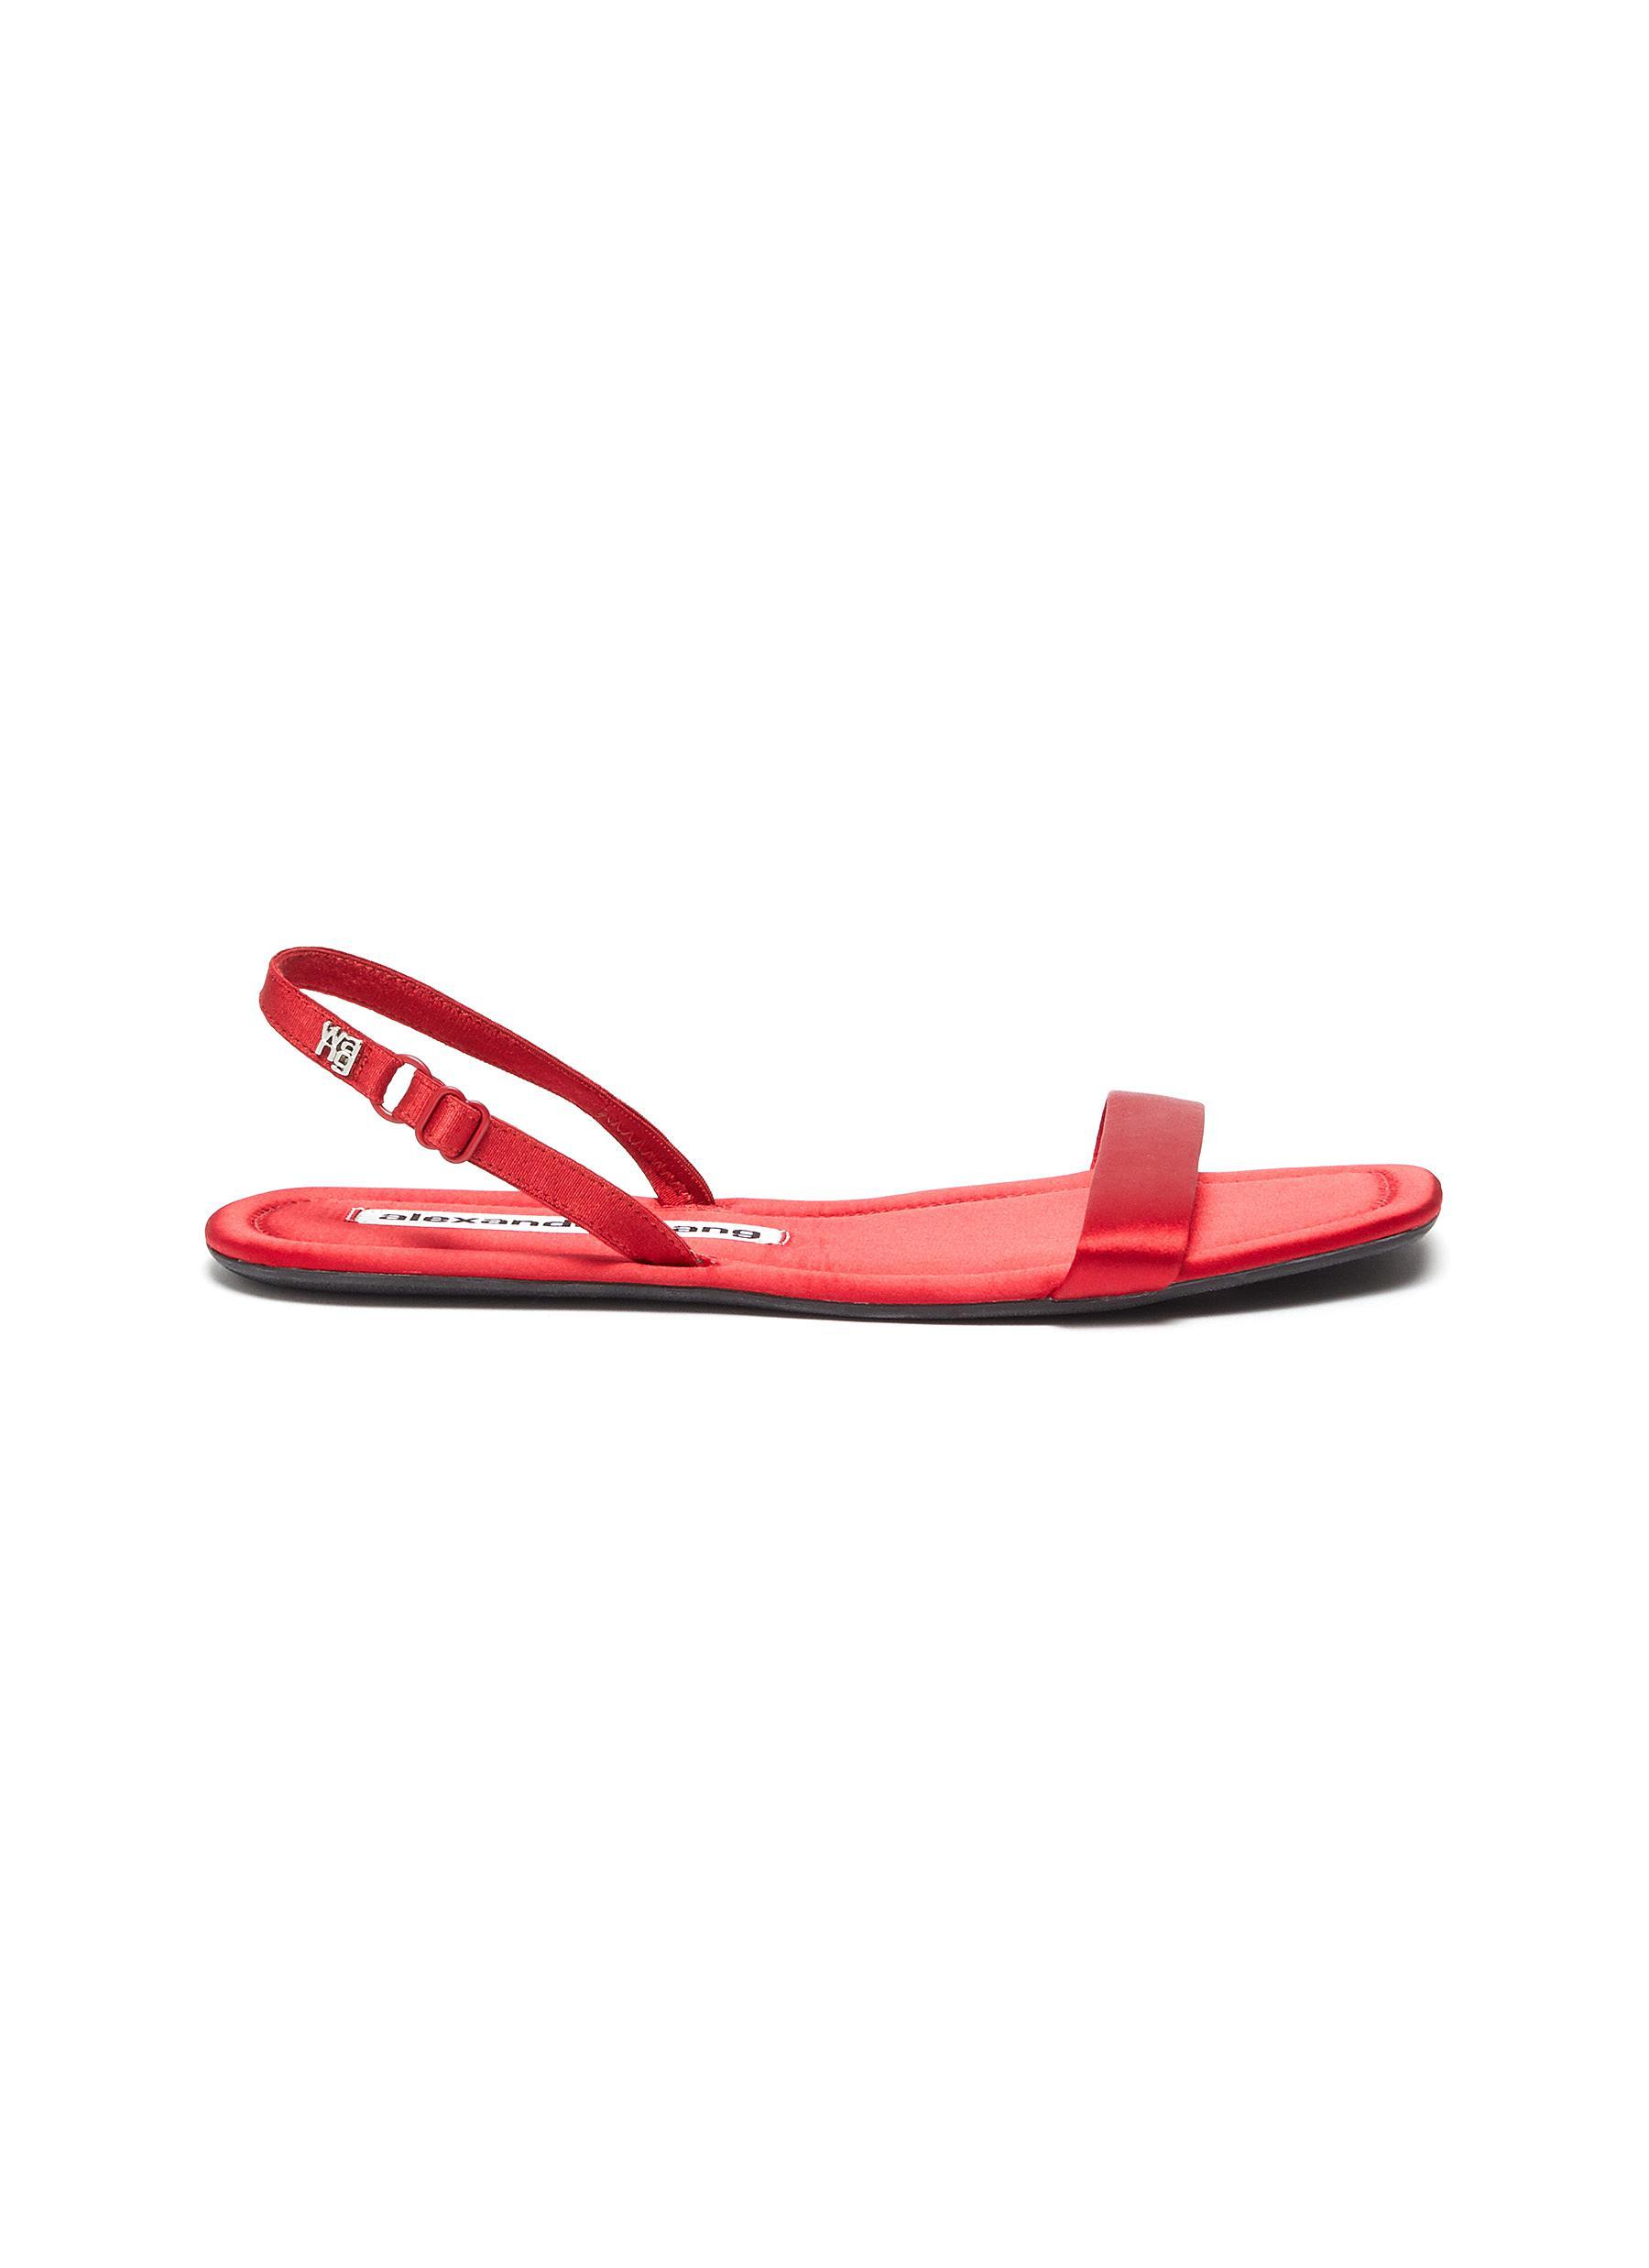 Alexander Wang Flats Fold up satin sandals